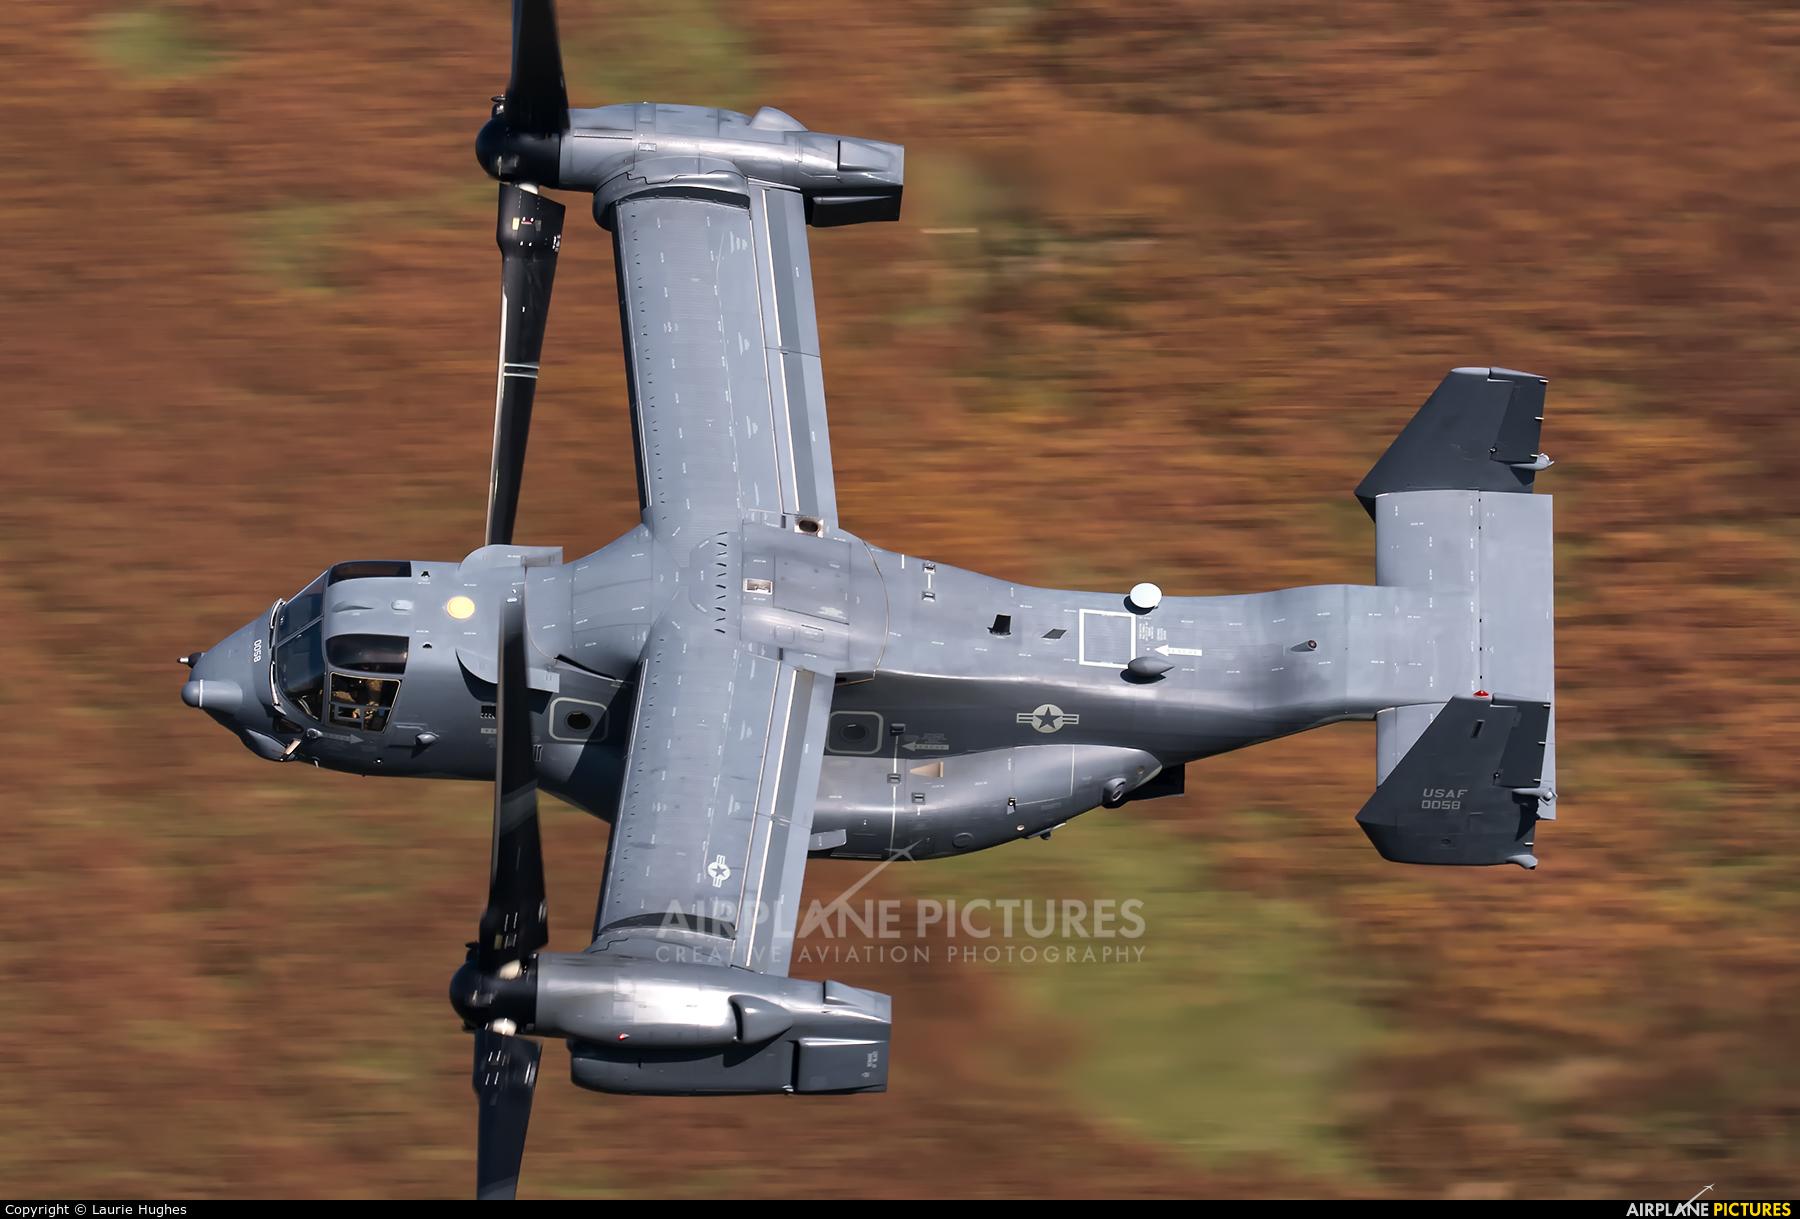 USA - Air Force 11-0058 aircraft at Machynlleth Loop - LFA 7